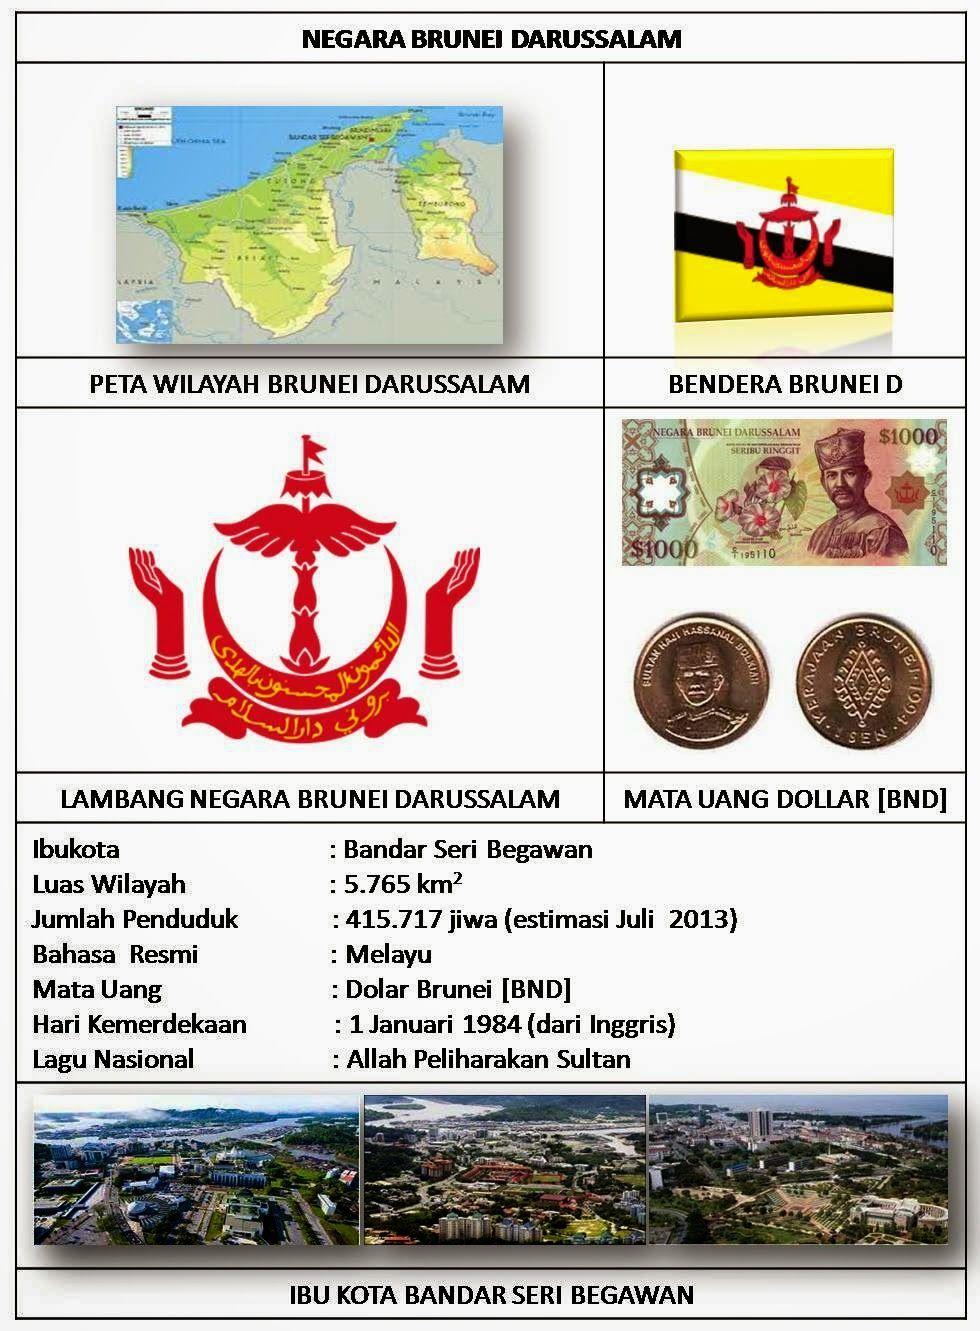 Gambar Bendera Dan Lambang Negara Brunei Darussalam